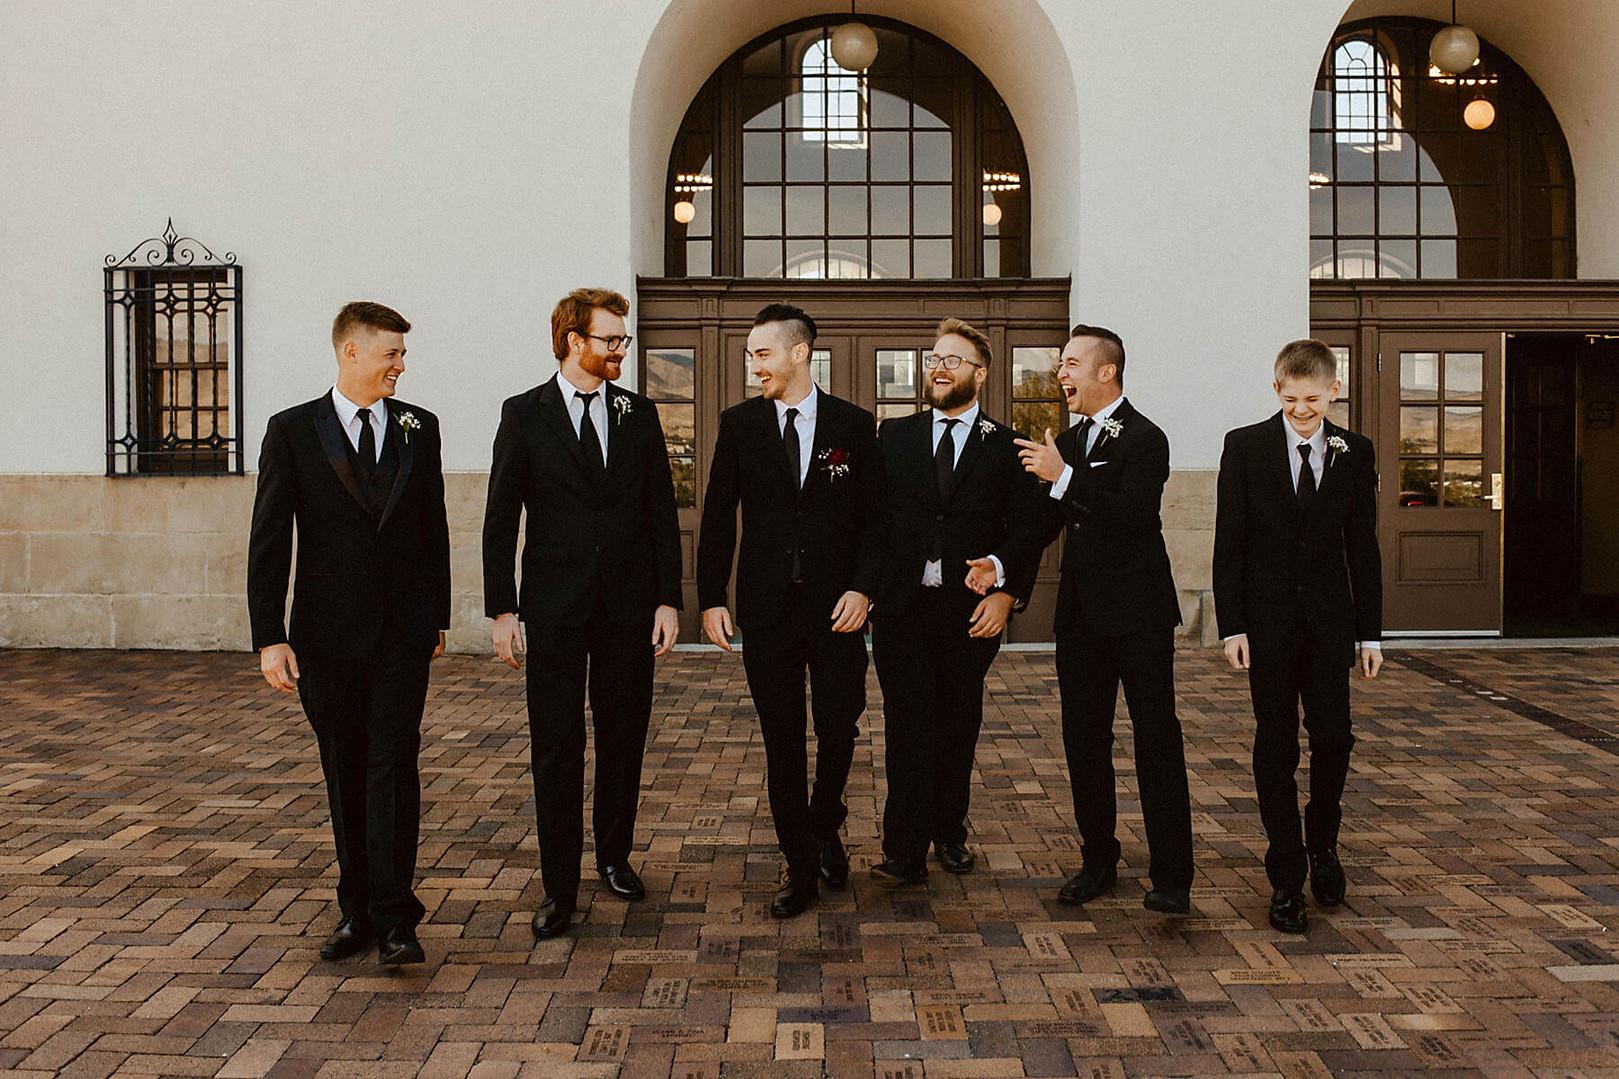 Wedding-Photography-Groomsmen-Posing.jpg